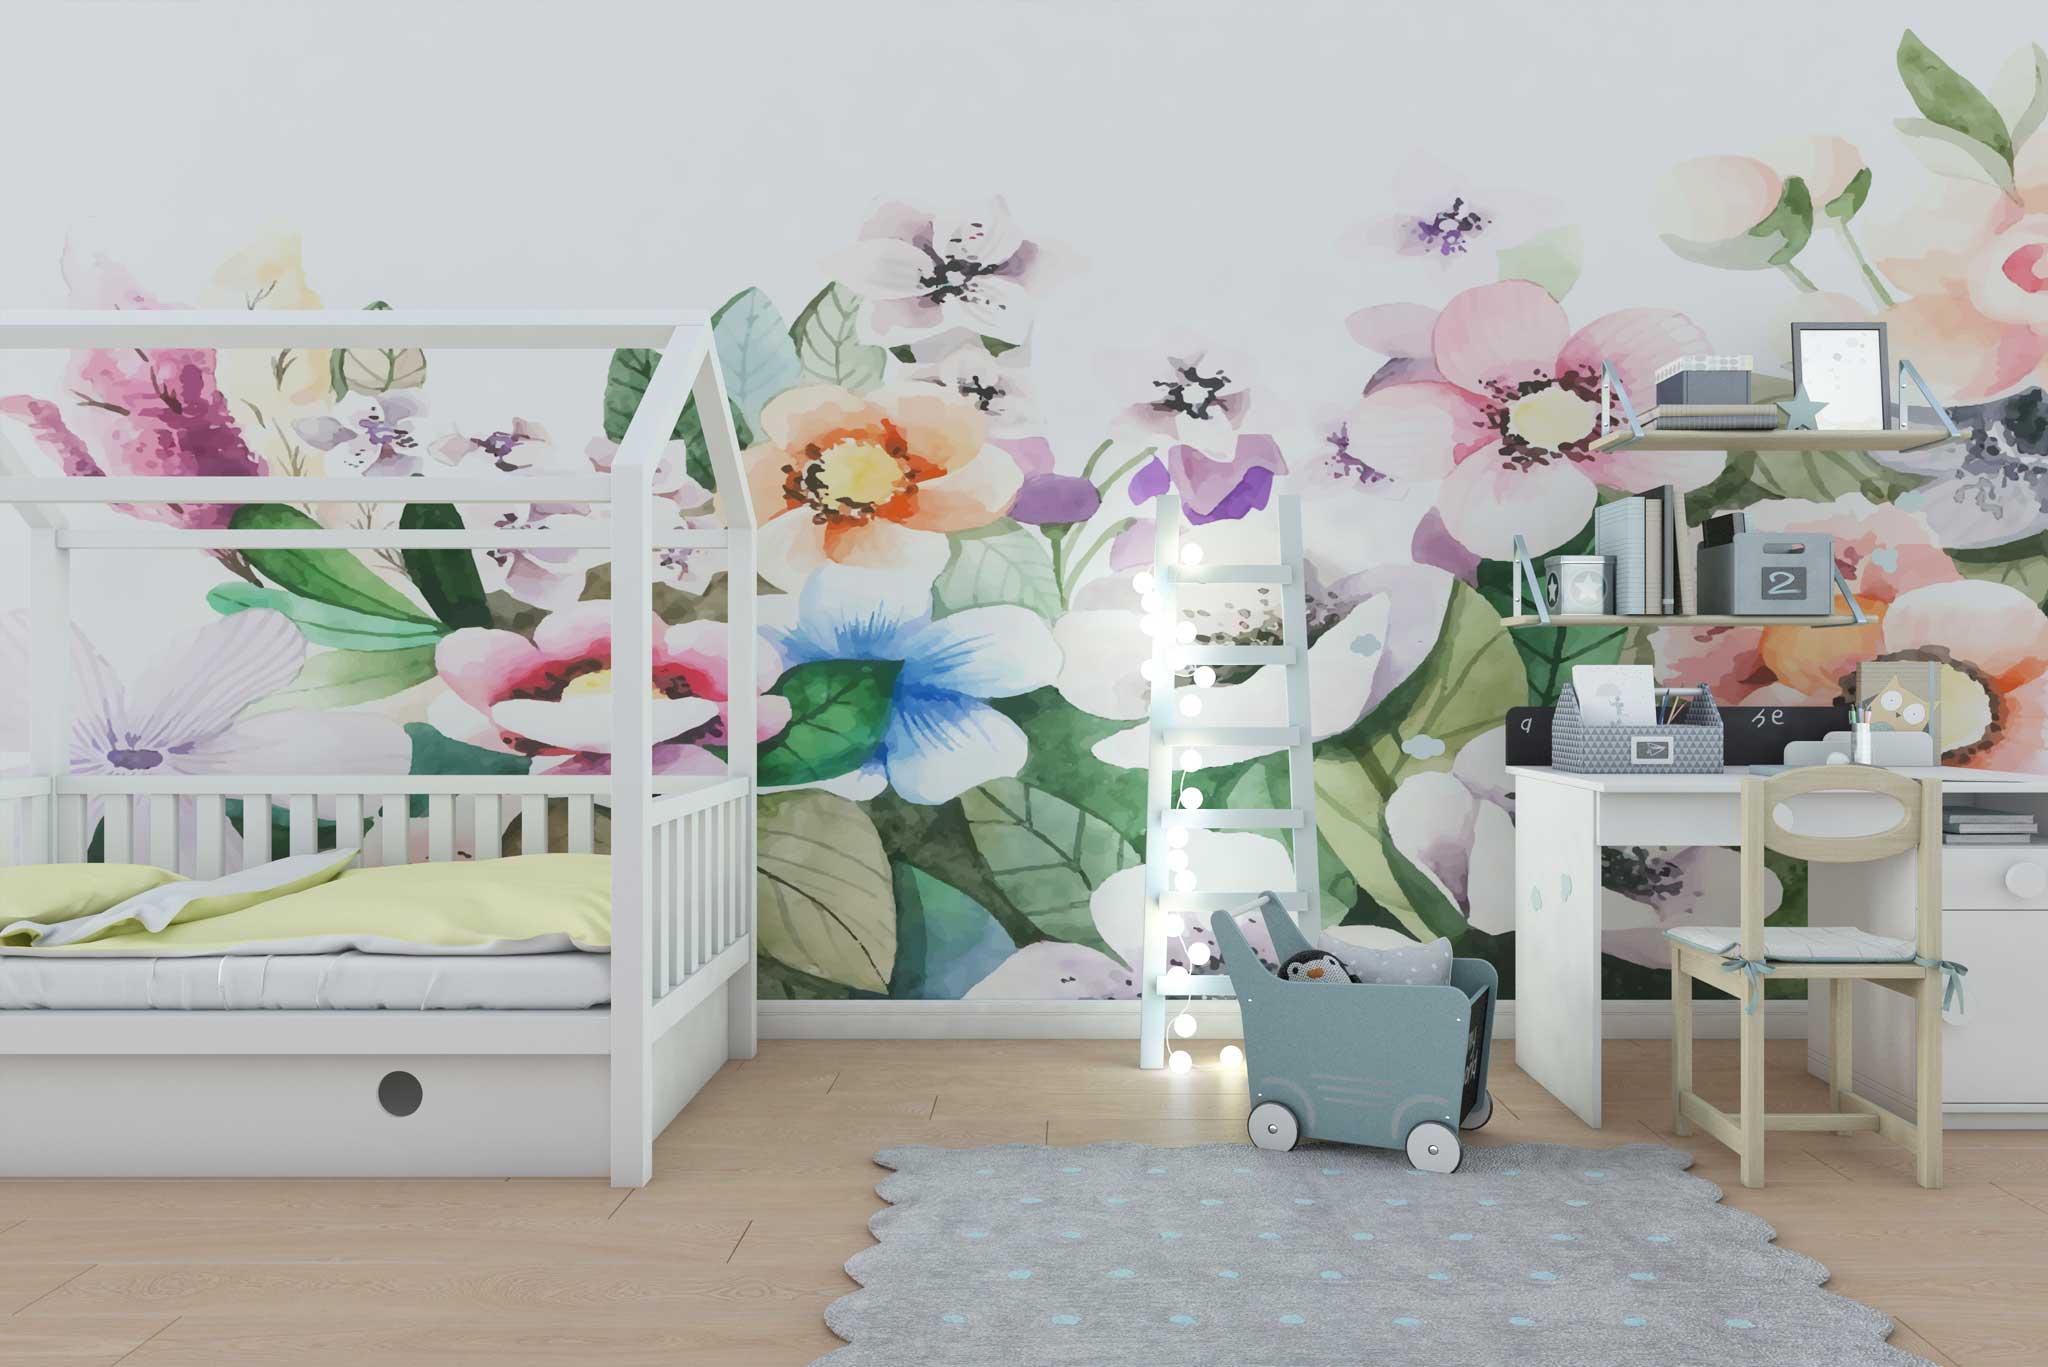 https://daringprints.ro/wp-content/uploads/2020/12/tapet-fototapet-design-personalizat-customizabil-comanda-special-camera-dormitor-copii-model-motiv-floral-flori-pictate-acuarela-fundal-alb-multicolor-pastel.jpg